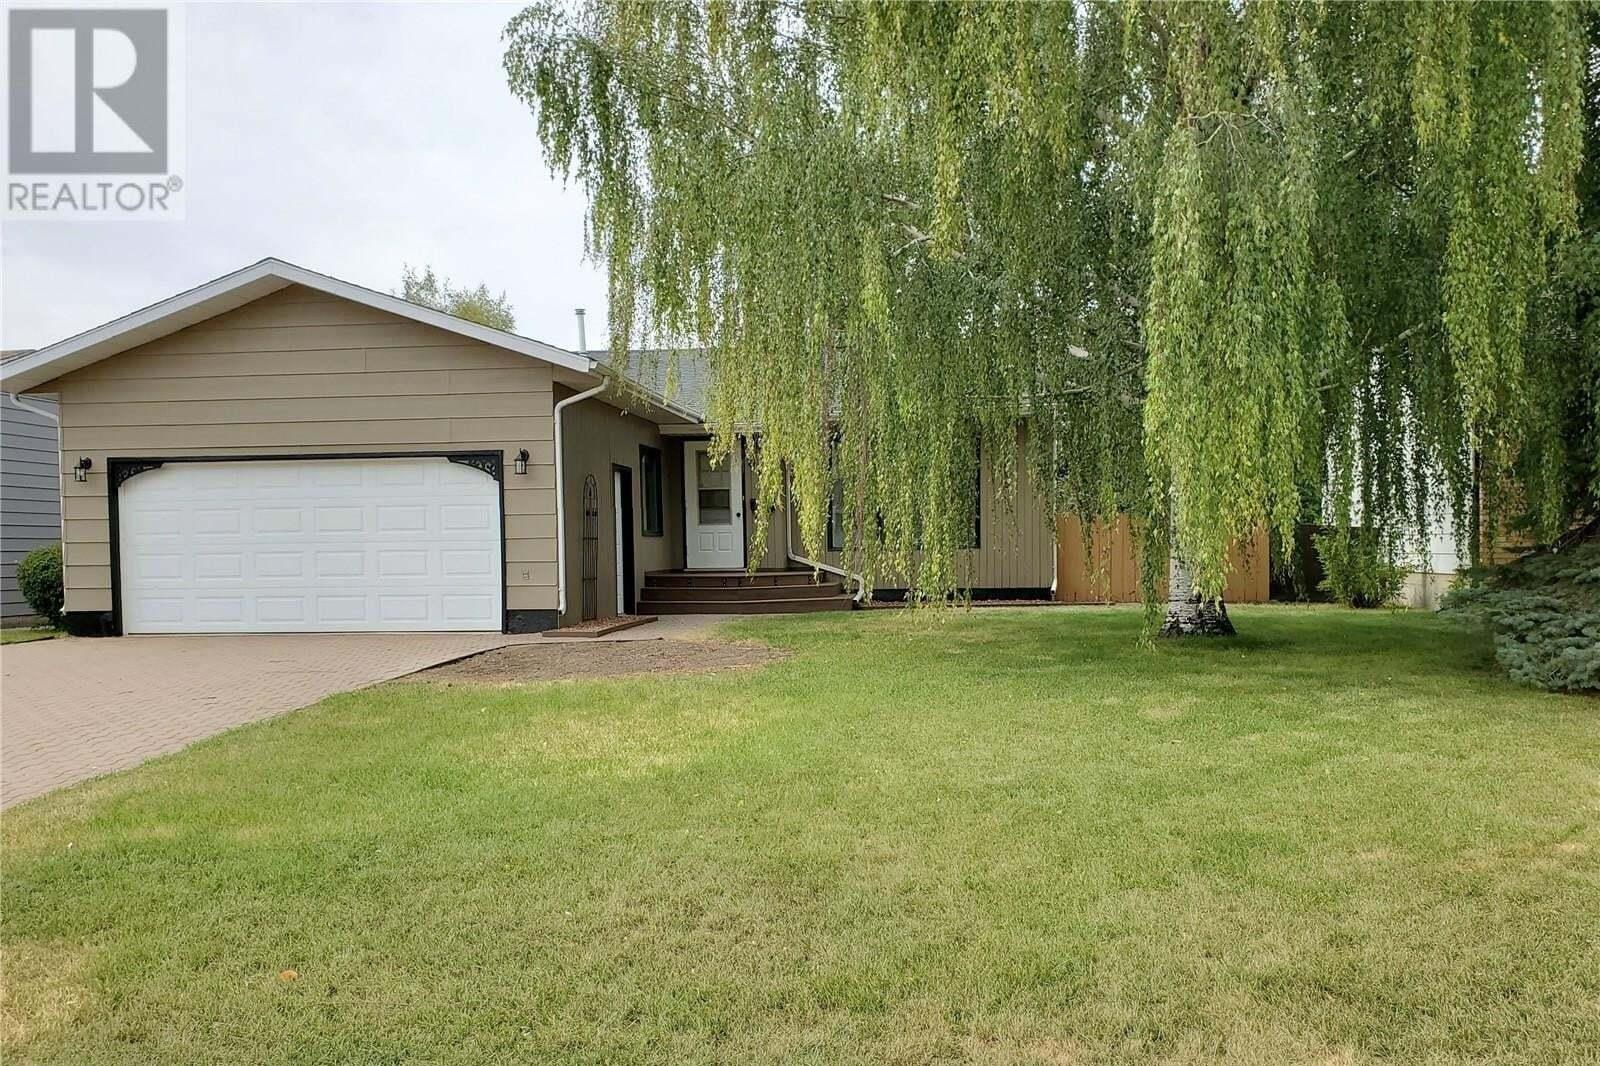 House for sale at 508 Mcgillivray St Outlook Saskatchewan - MLS: SK821225